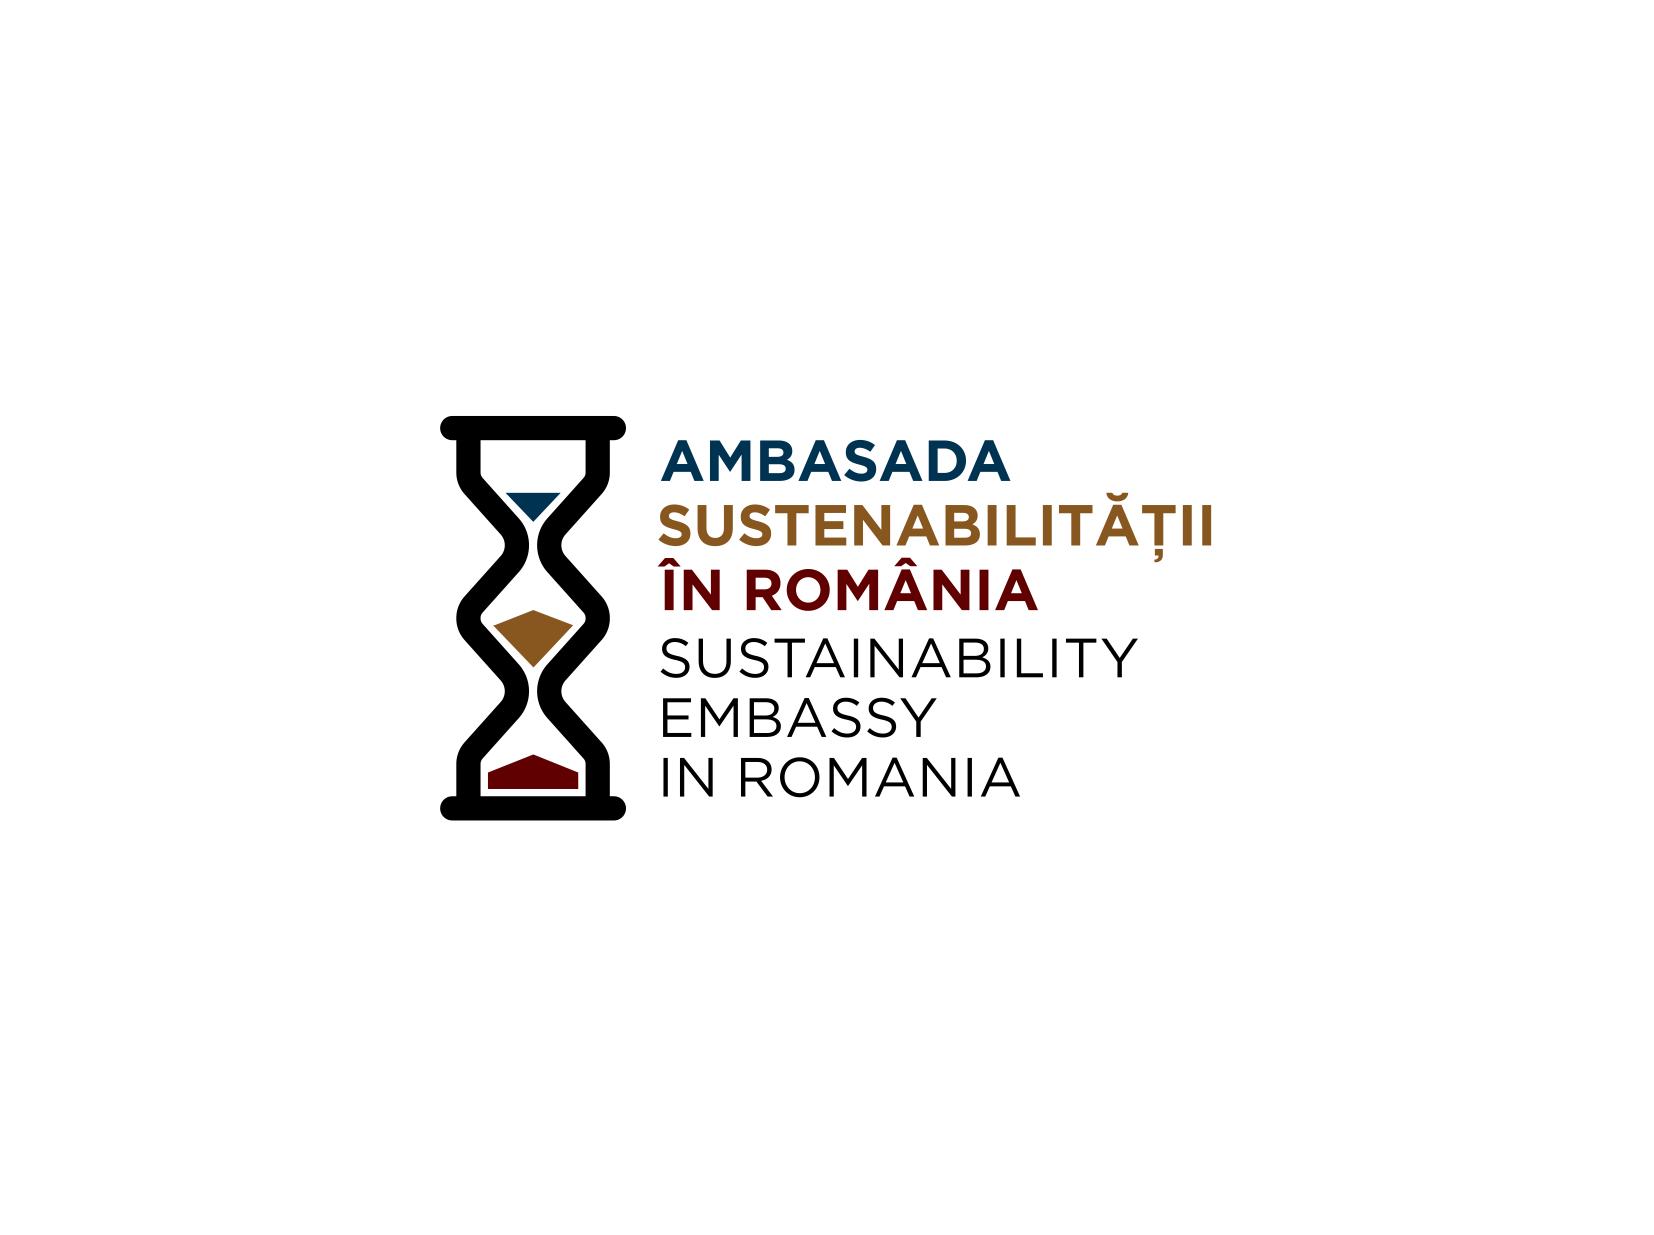 Ambasada Sustenabilității în România (ASOCIAȚIA RESPONSIBLE BUSINESS)